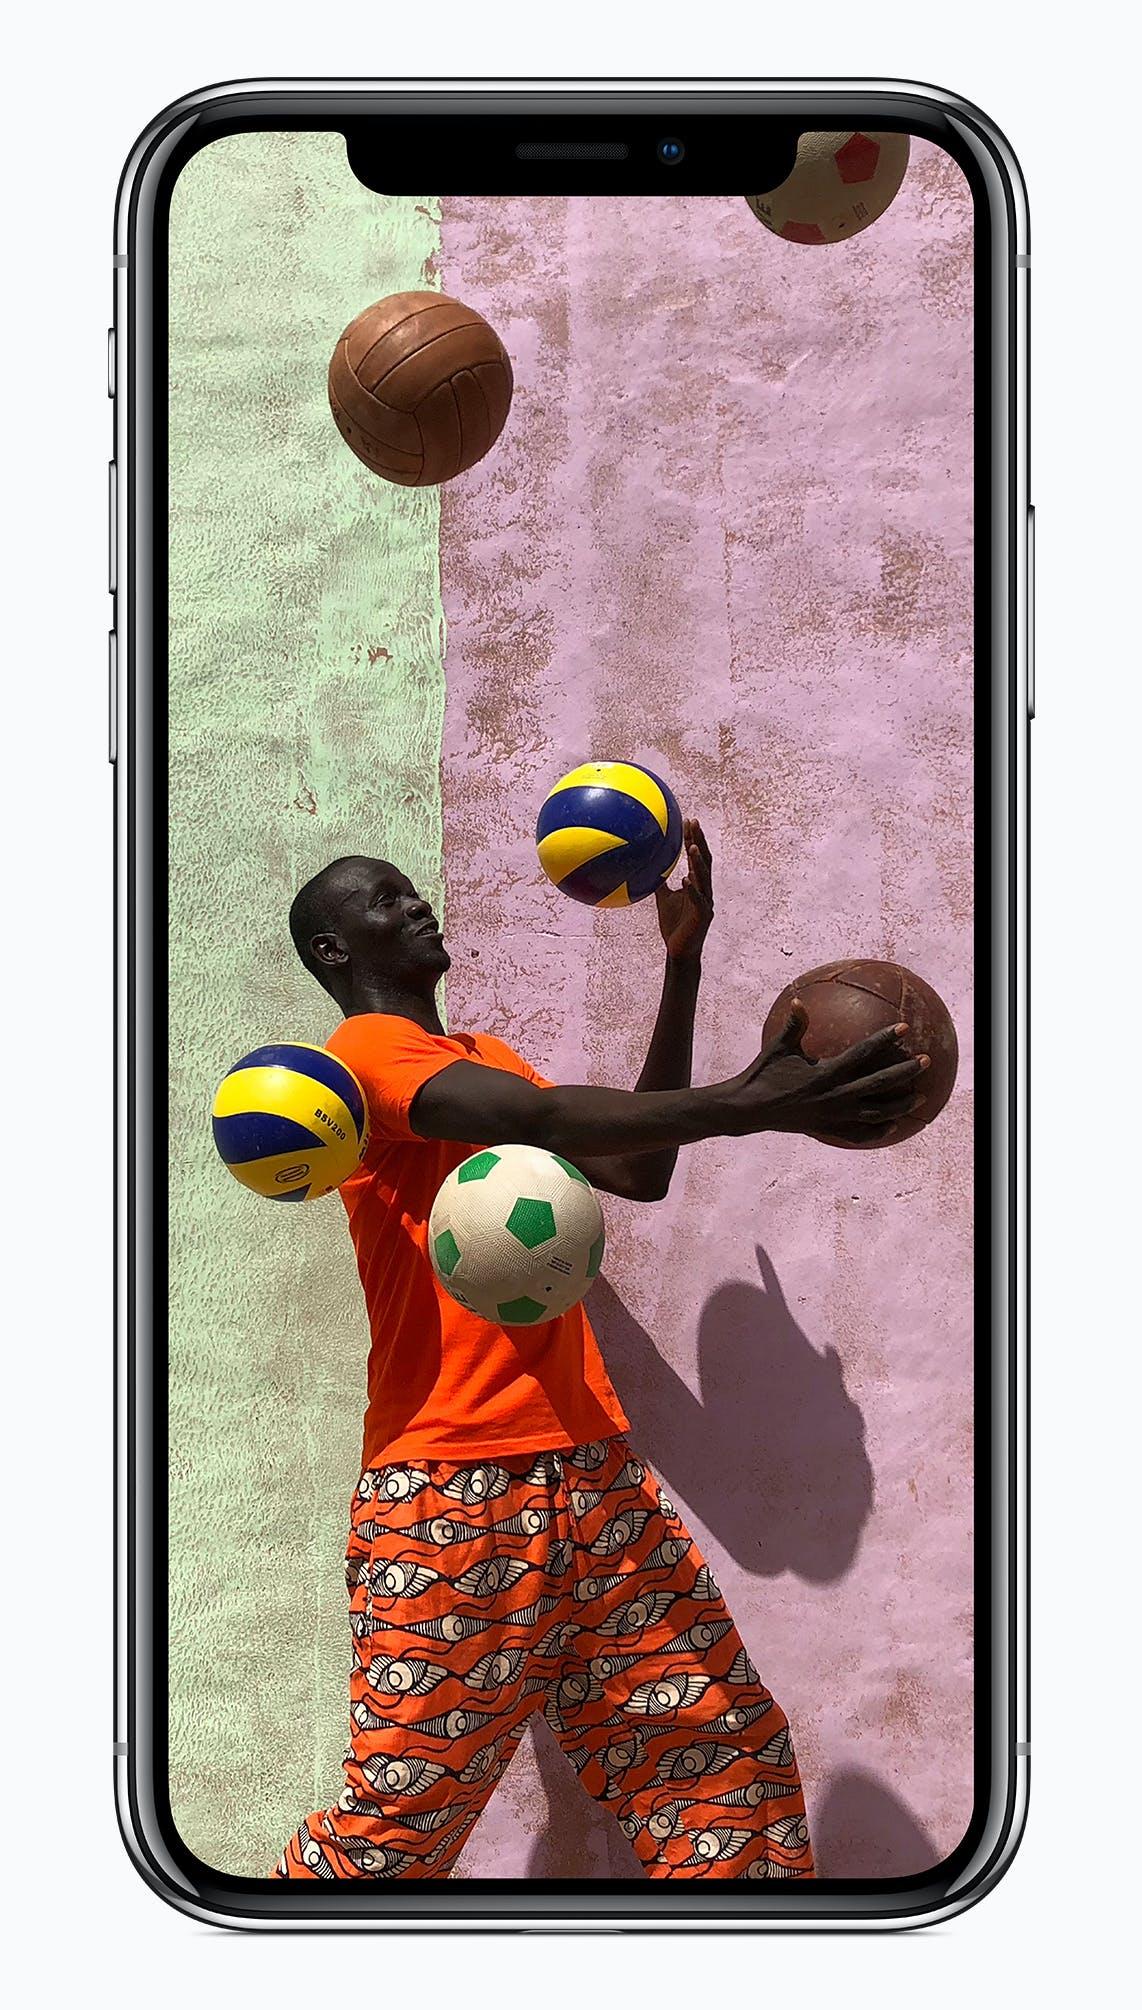 iOS, iPhone, iPhone X., 手機 的 免費圖庫相片